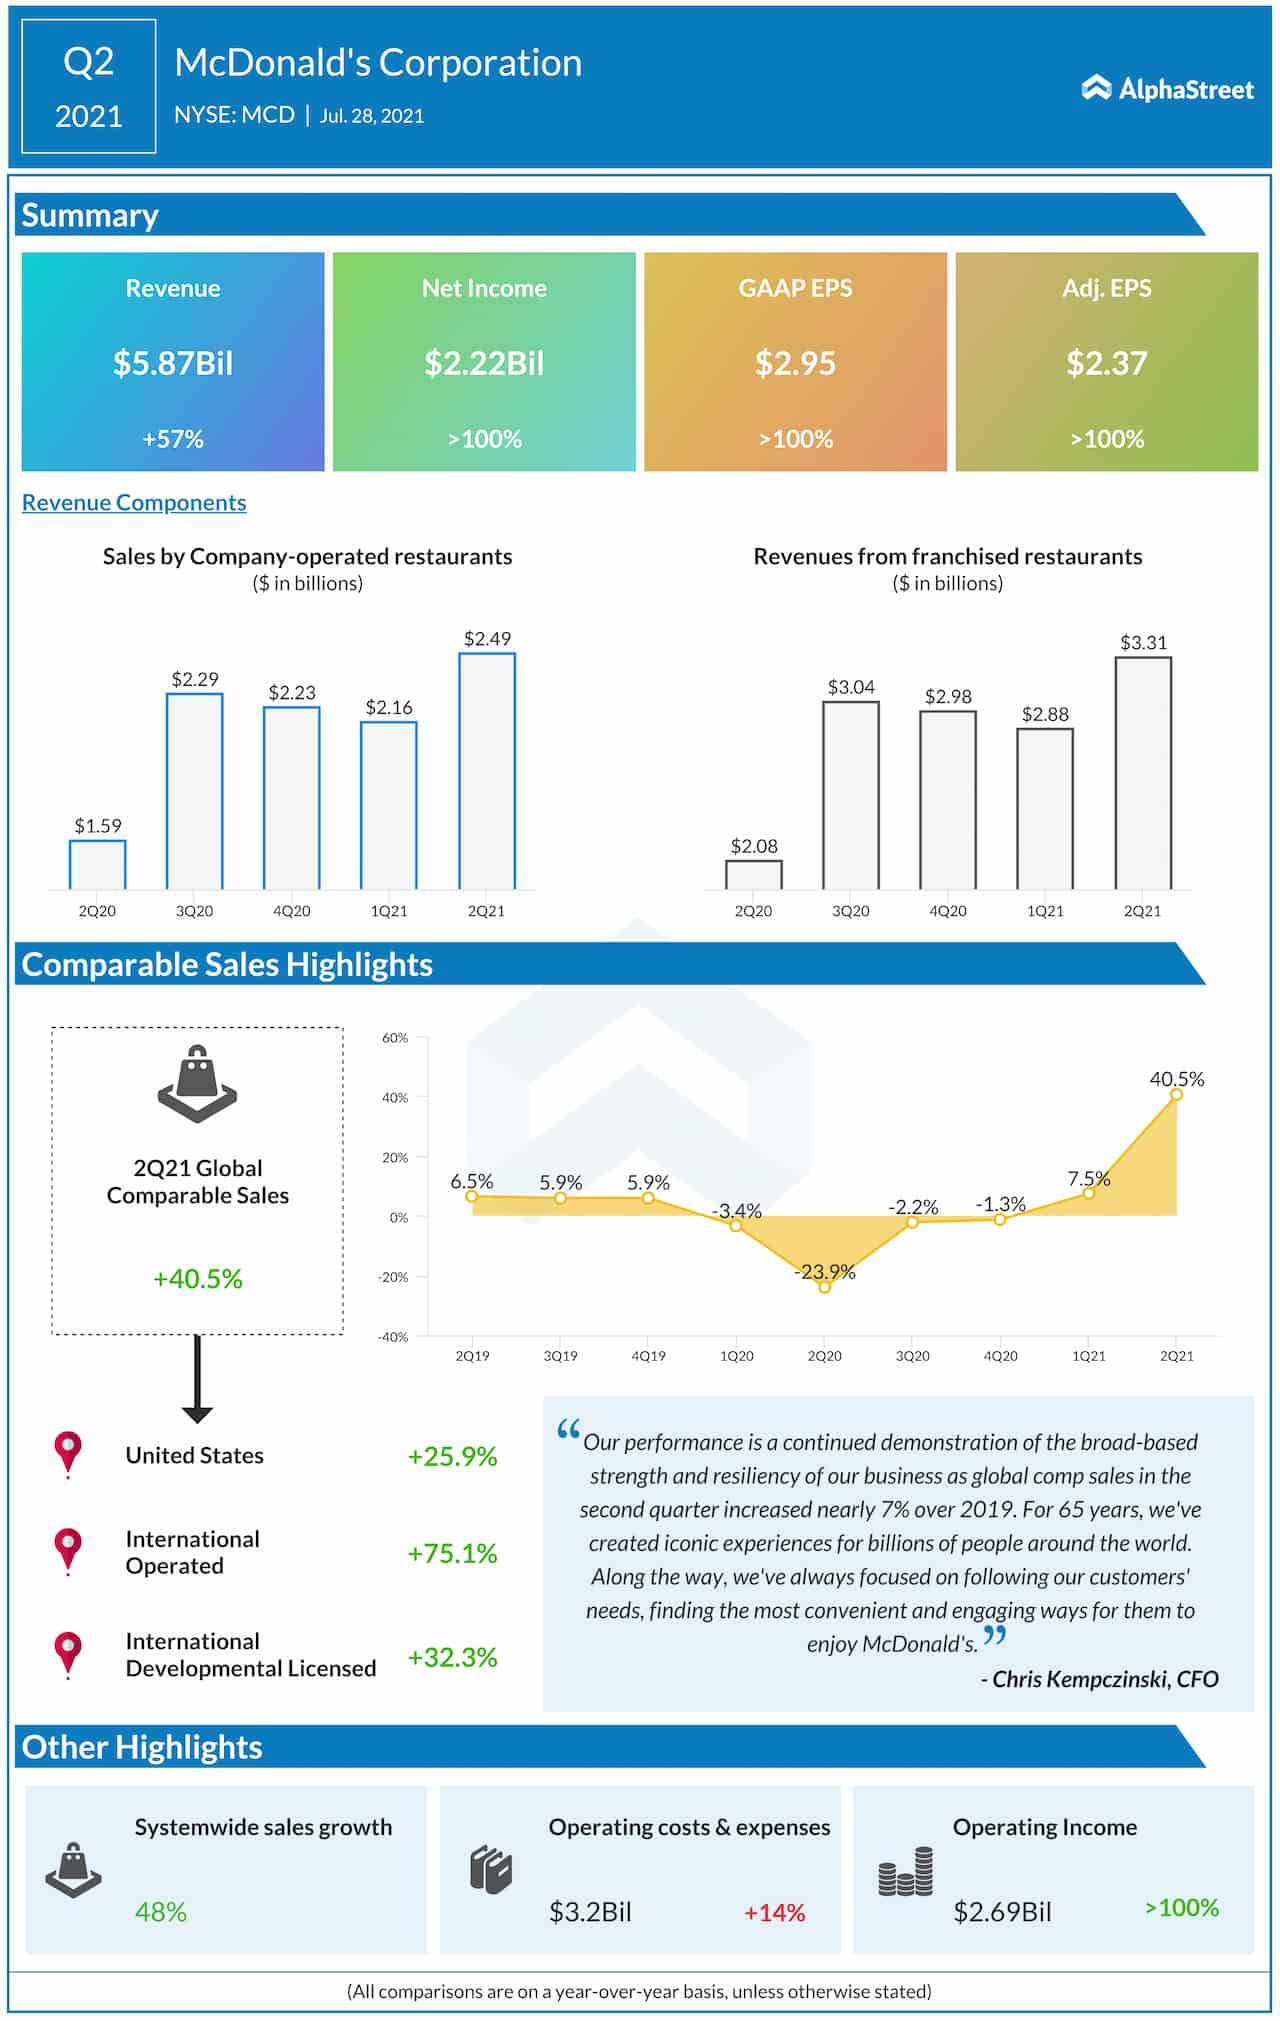 McDonald's Q2 2021 earnings infographic